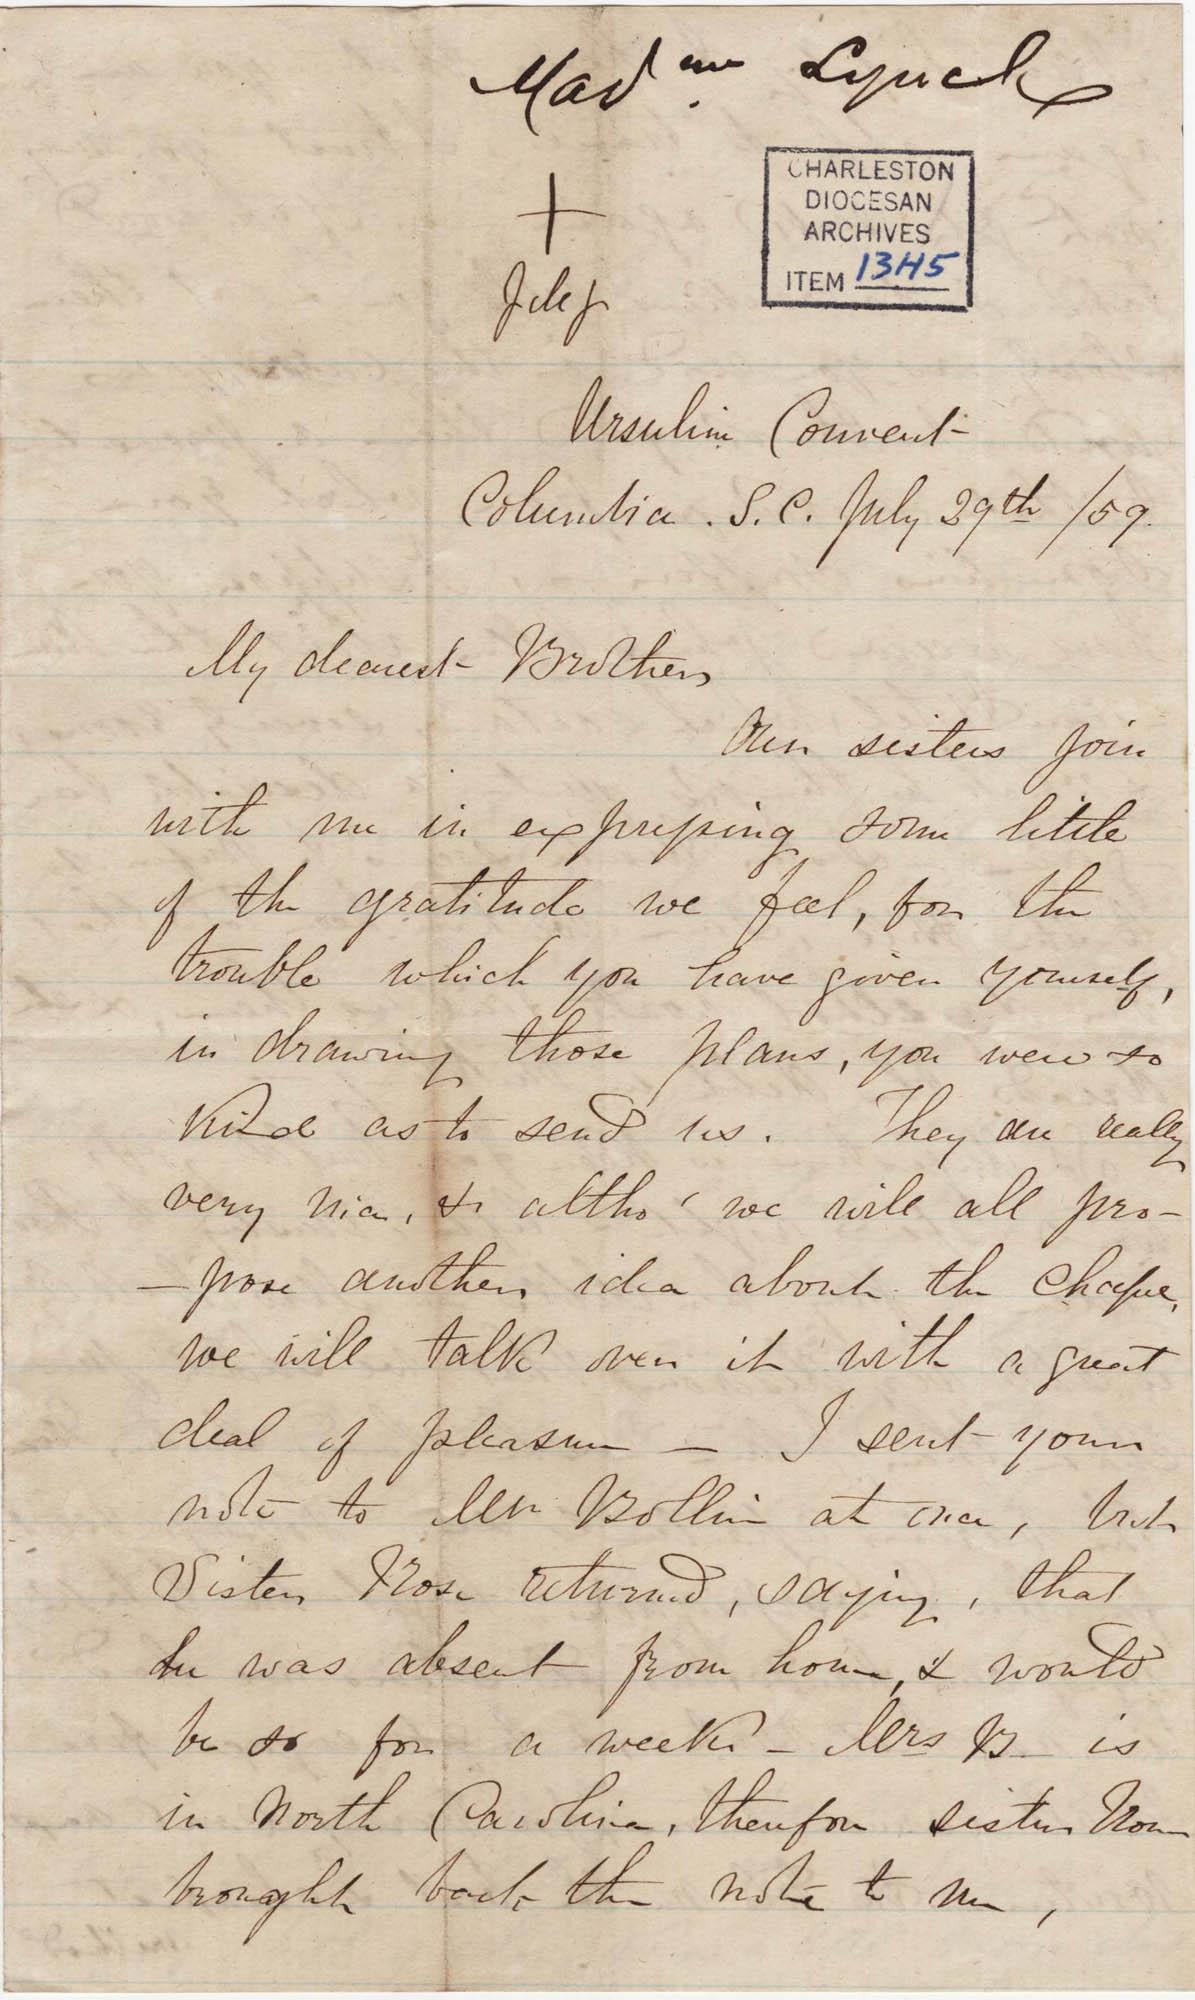 065. Madame Baptiste to Bp Patrick Lynch -- July 29, 1859